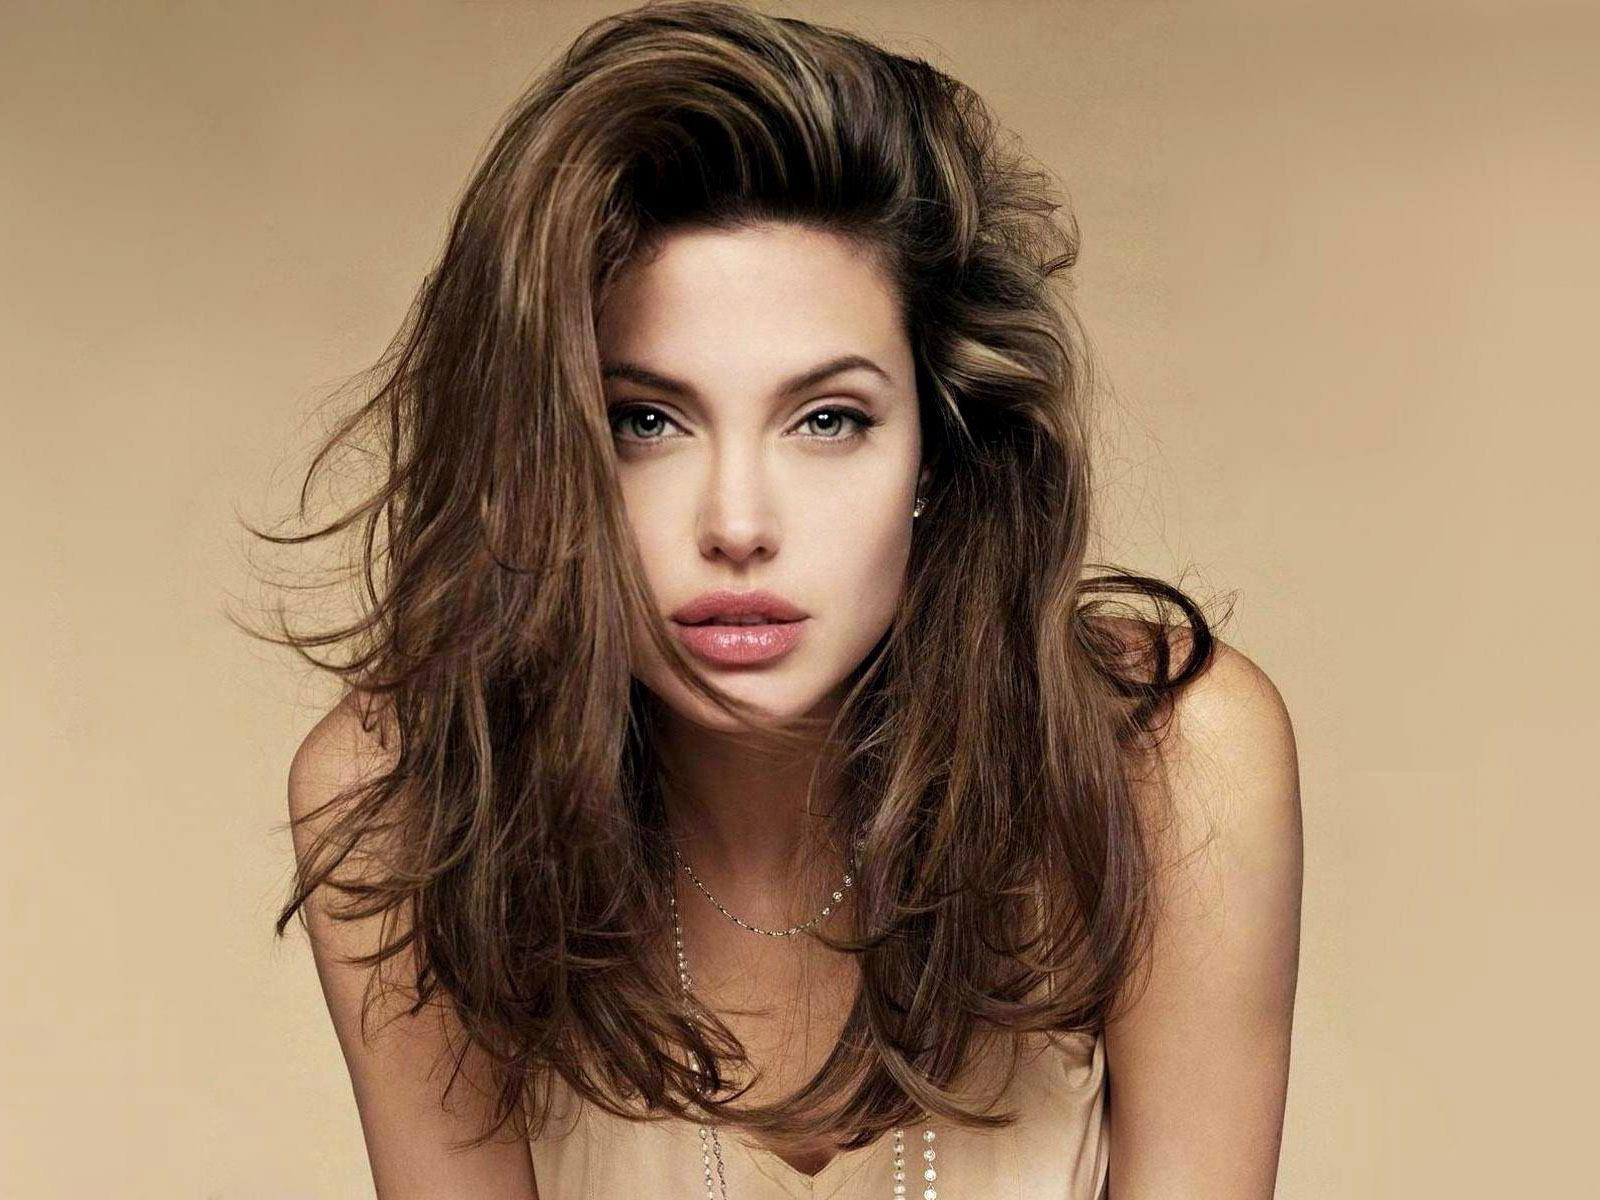 http://2.bp.blogspot.com/-vzSHMHywJLA/UCGmOVSTMyI/AAAAAAAAHVU/MSLQ5Ikh9i8/s1600/Angelina-Jolie-Hollywood-Celebrity.jpg